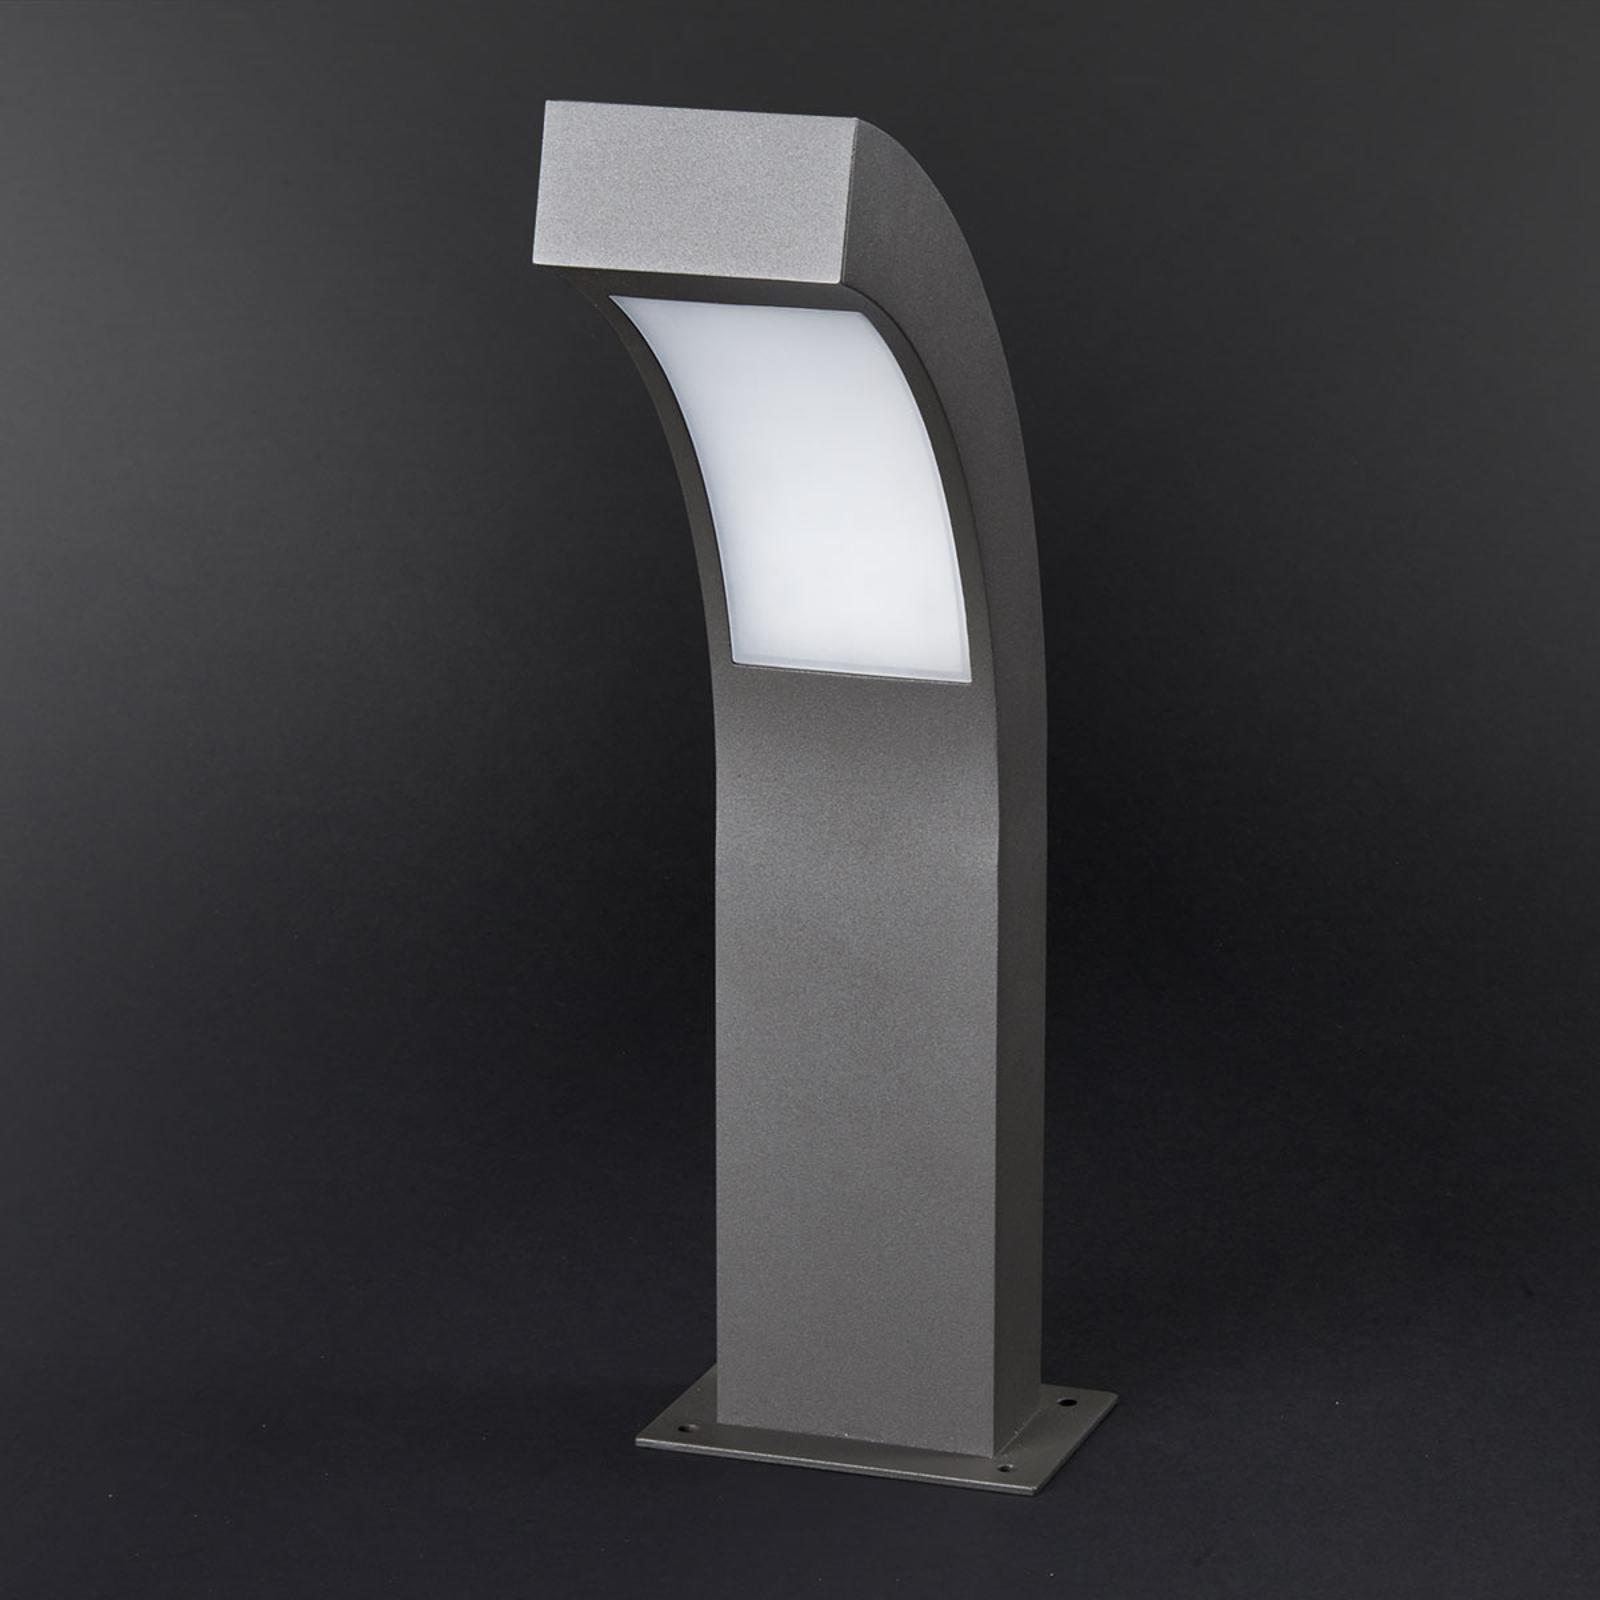 Geneigte LED-Sockelleuchte Lennik, 40 cm